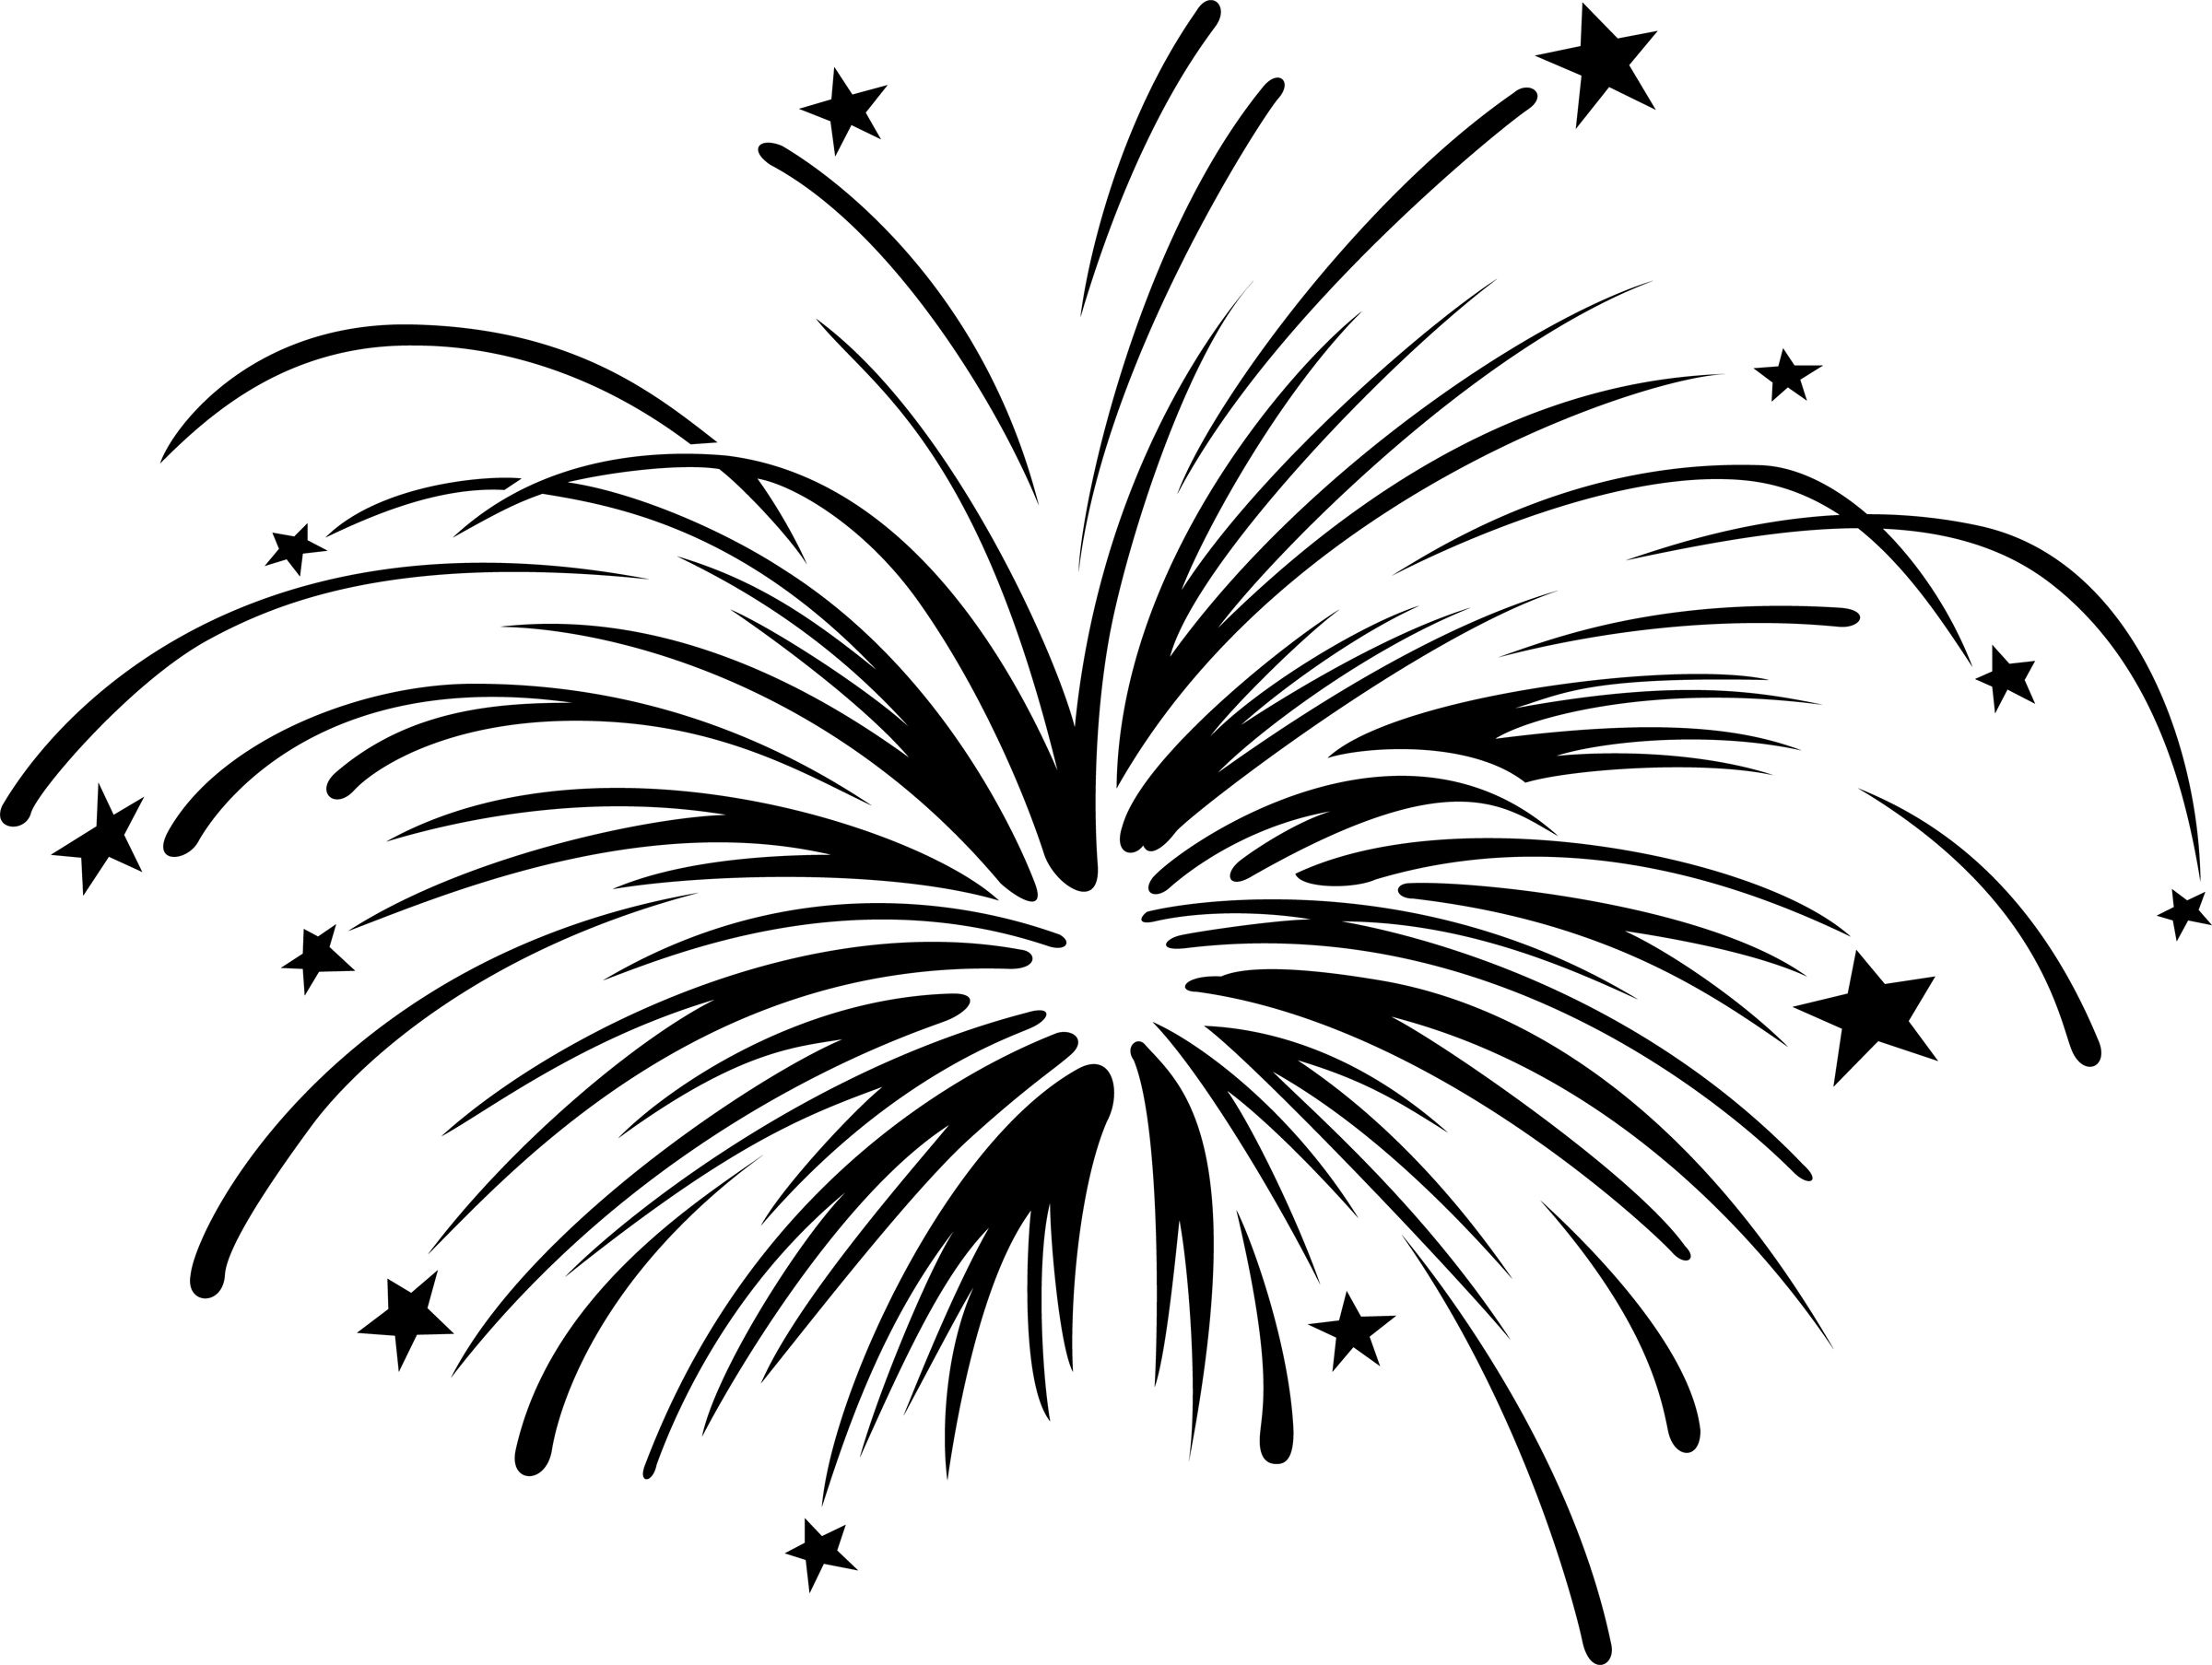 Fireworks clipart black and white clip art Fireworks Clipart With Animation | Clipart Panda - Free Clipart ... clip art